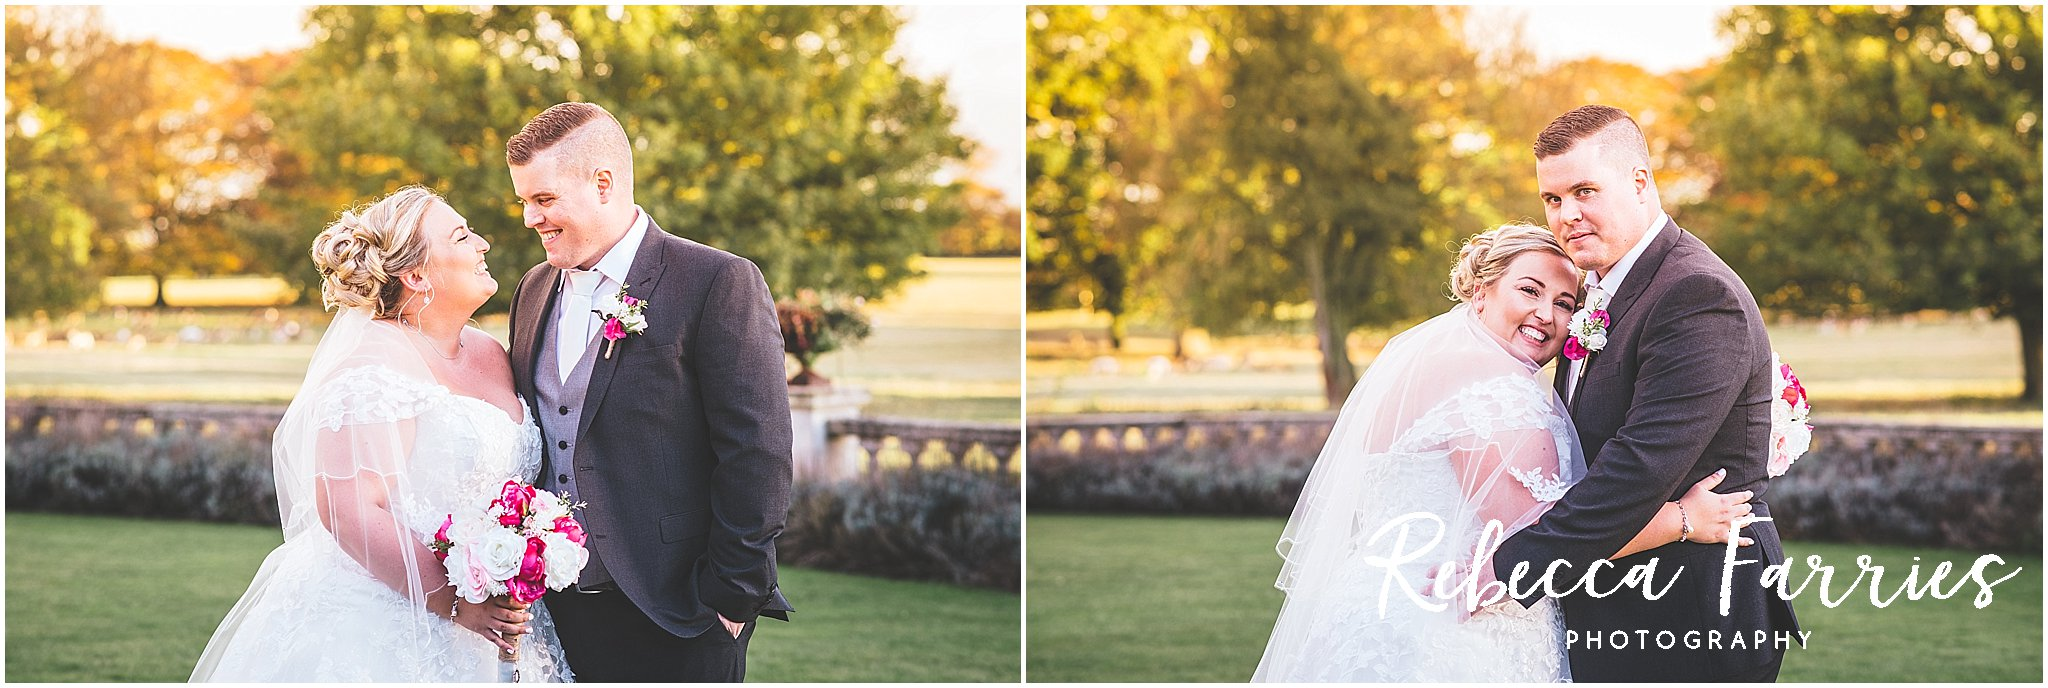 weddingphotographyparklands_0717